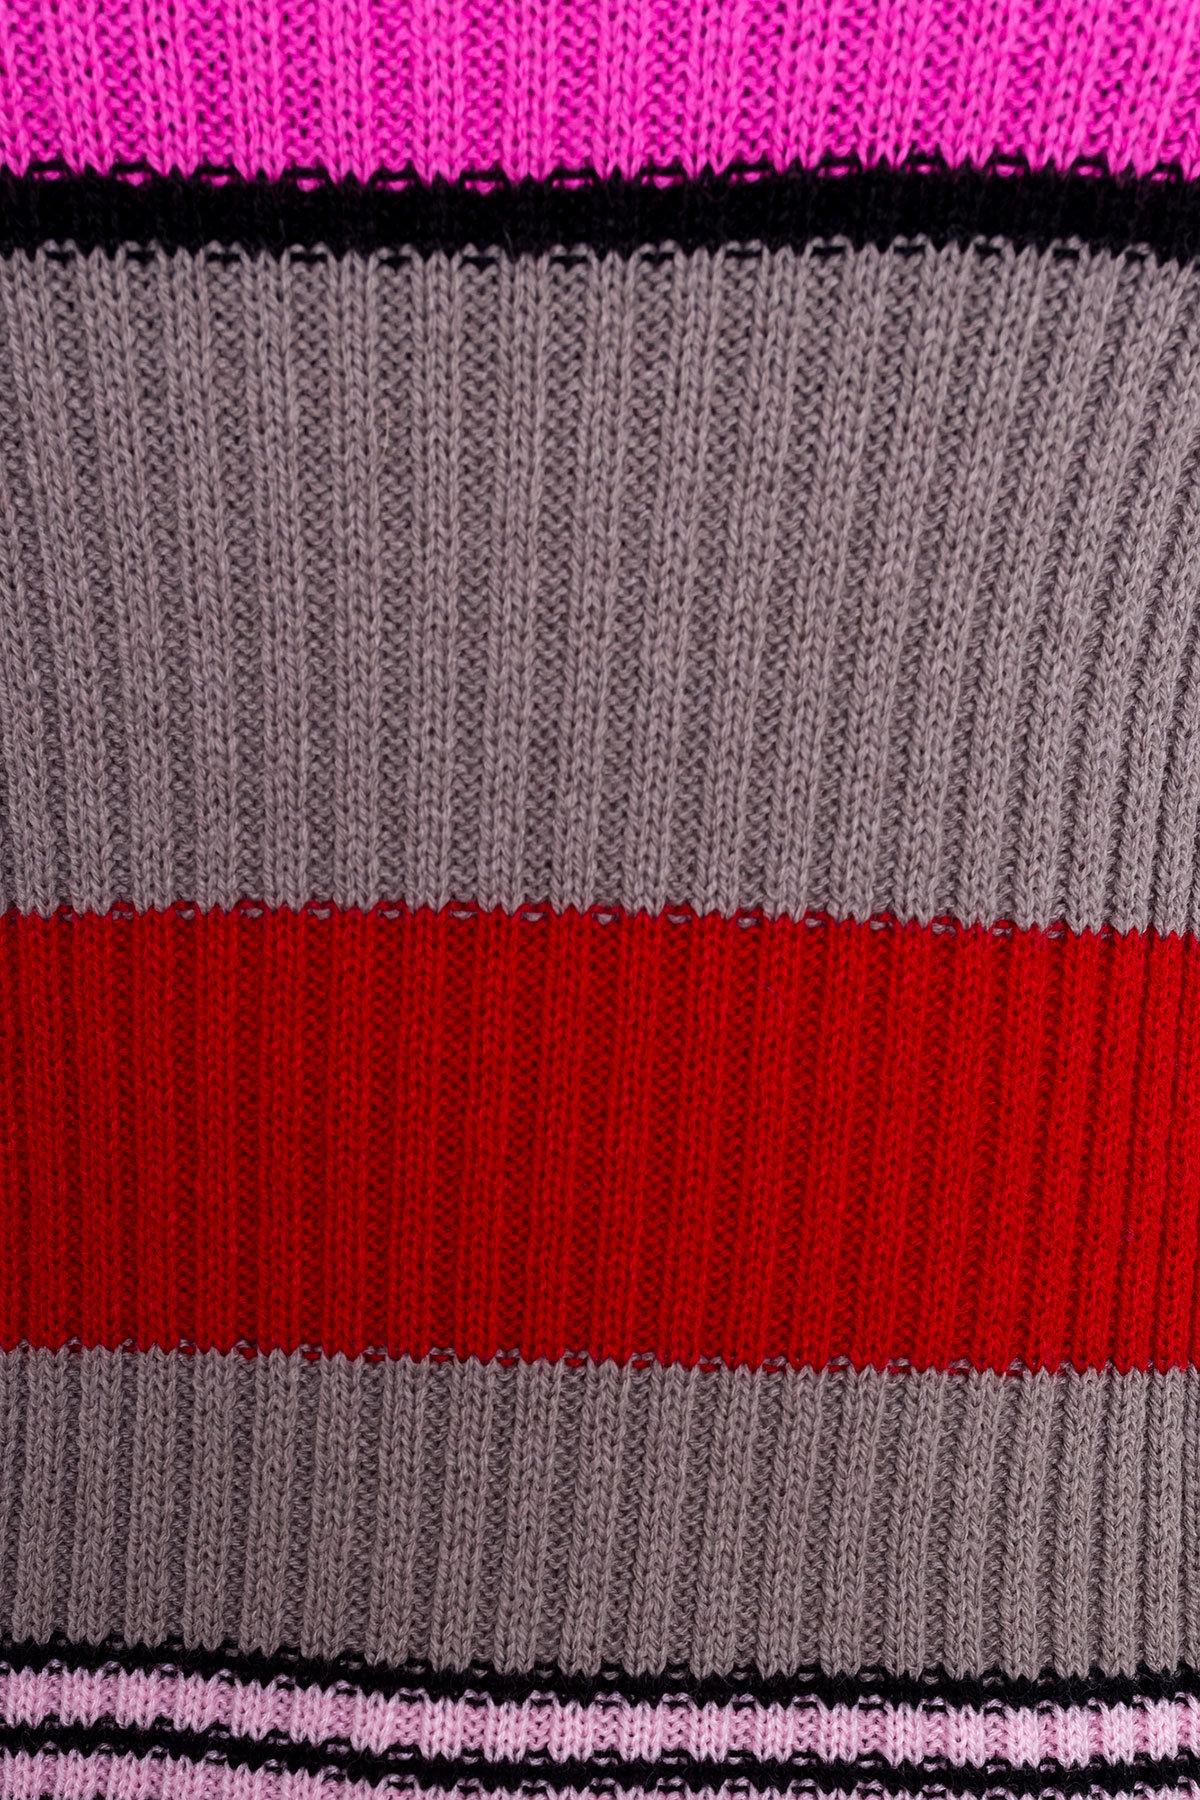 Гольф Кроха АРТ. 9960 Цвет: Вишня/малина/капучино - фото 4, интернет магазин tm-modus.ru